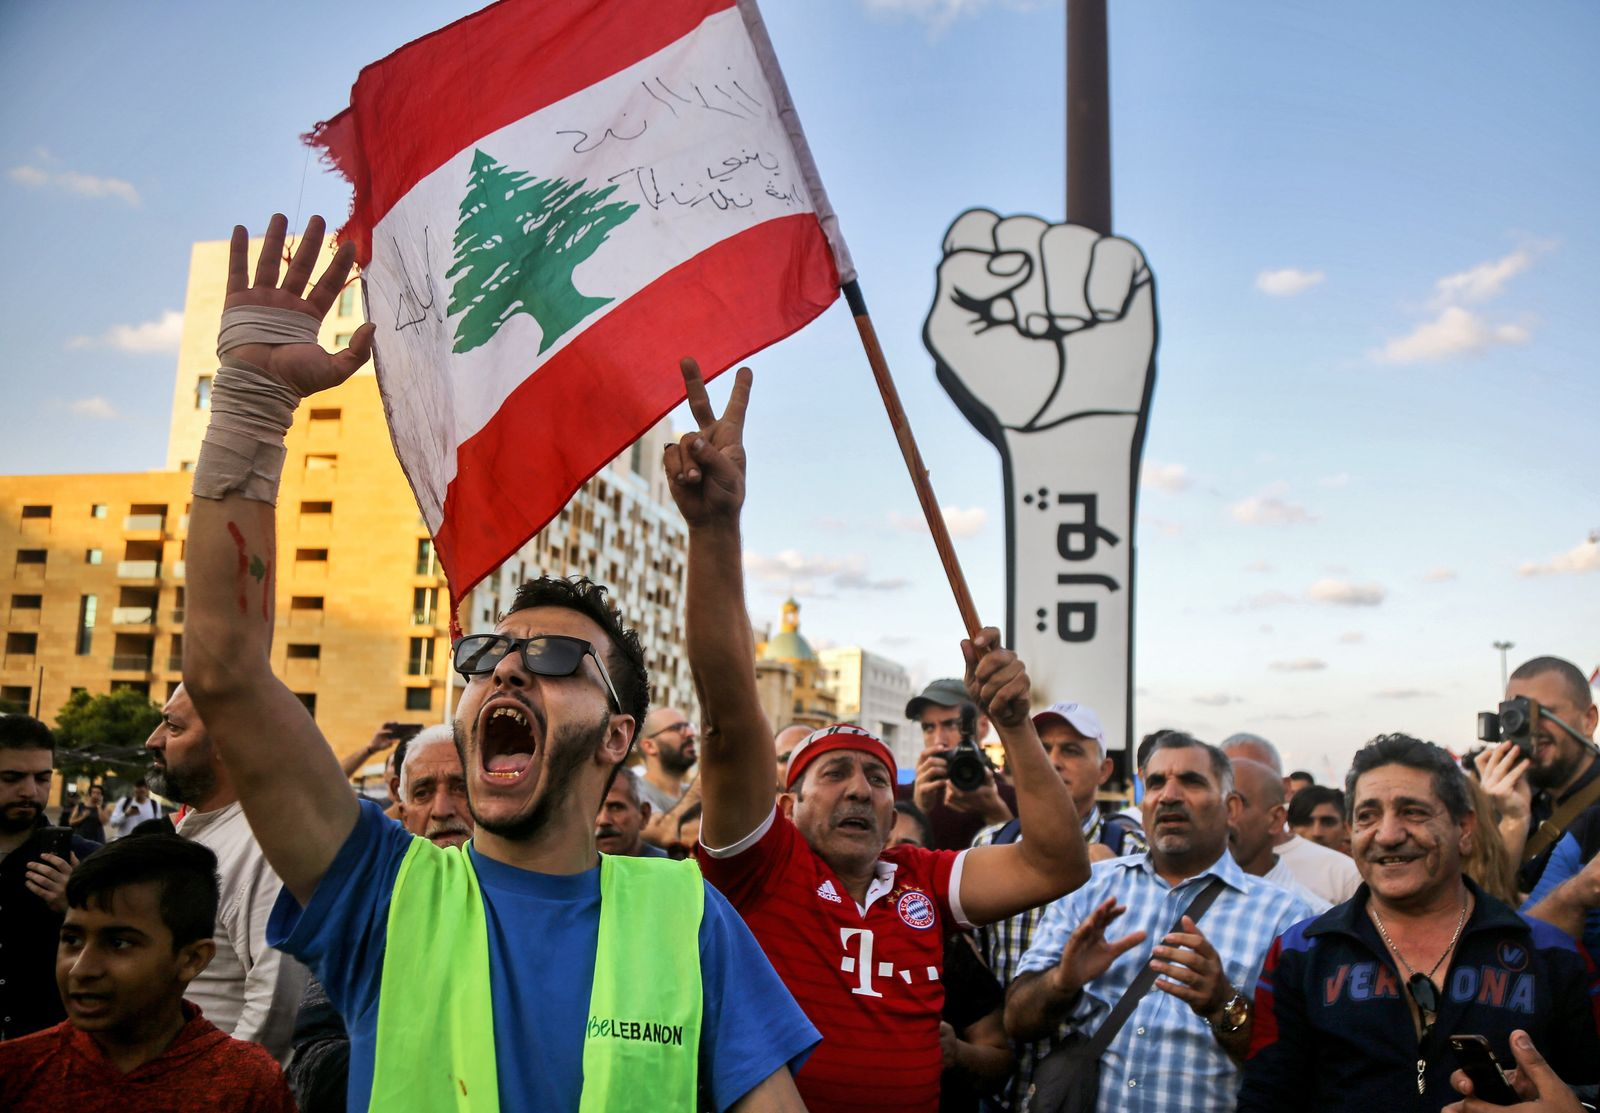 Proteste im Libanon - Lage